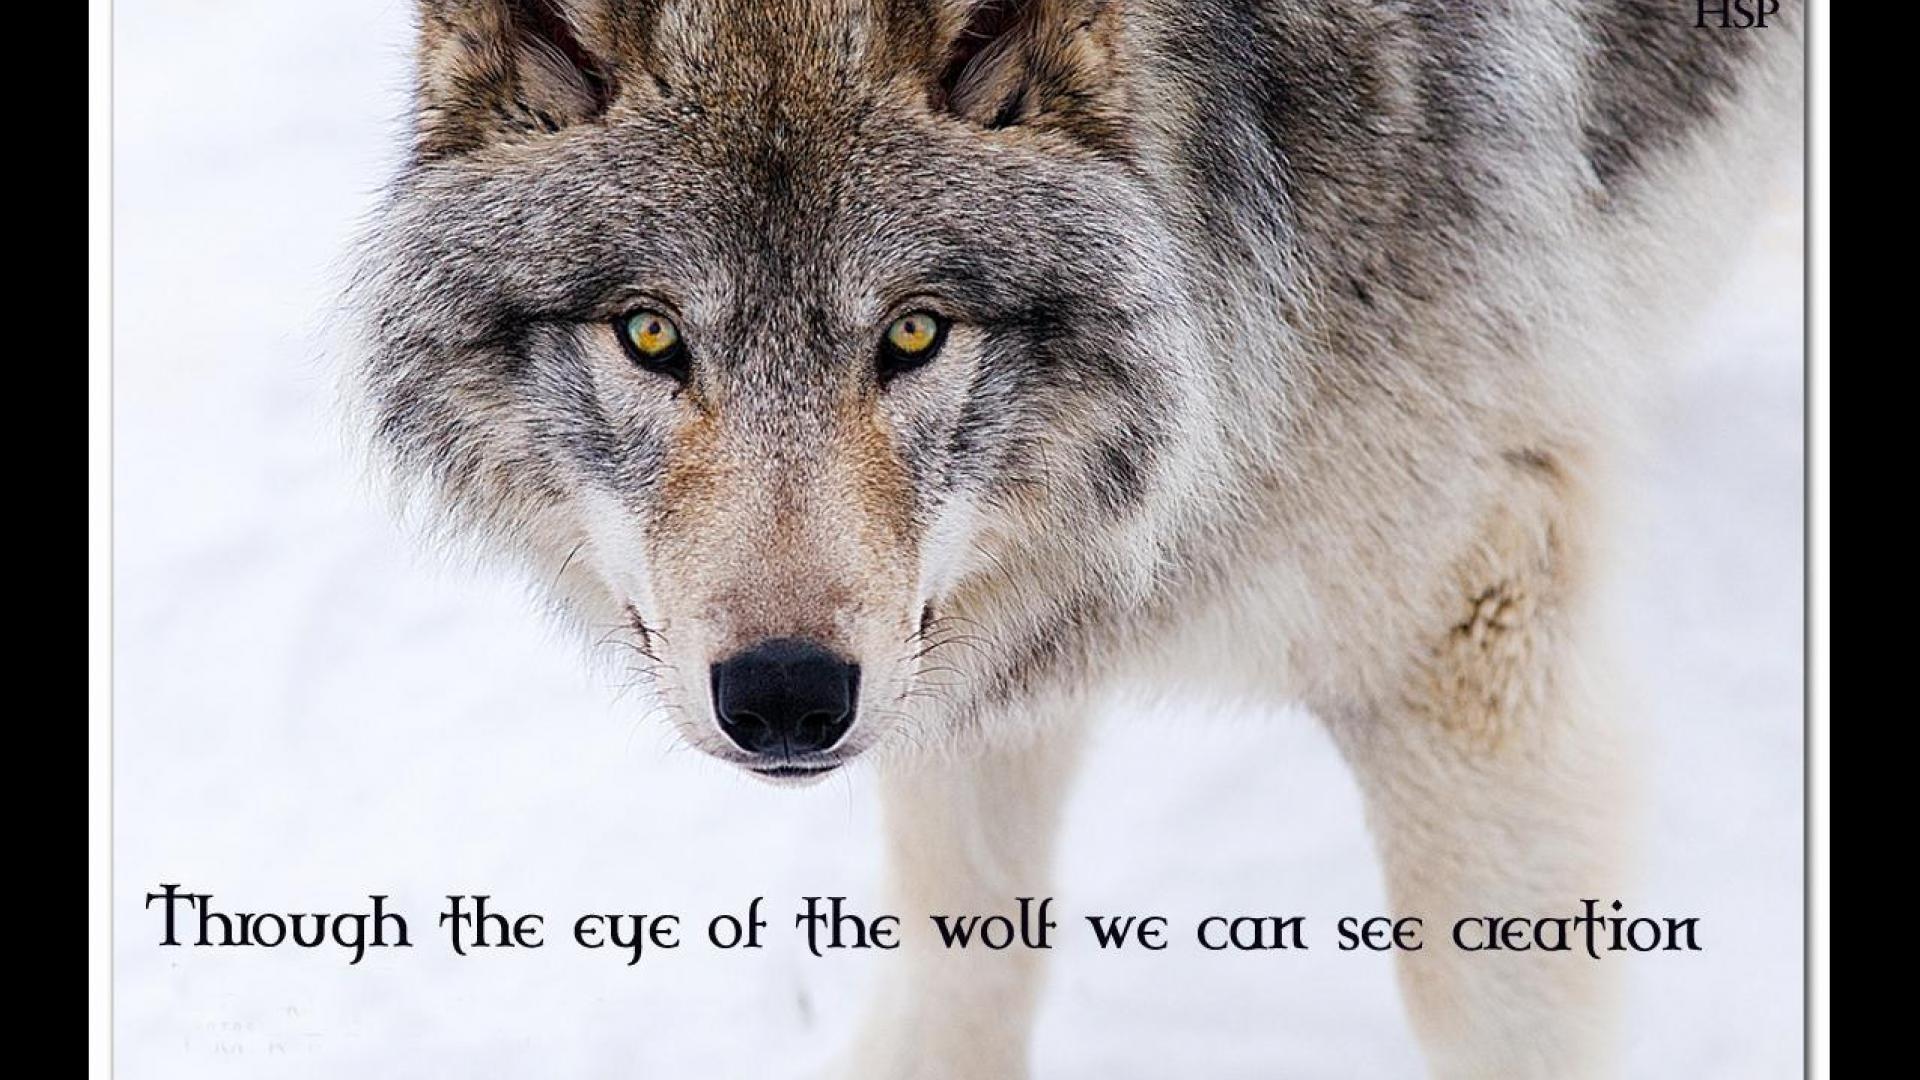 Download Wallpaper ID 1566801 – Desktop Nexus Animals   ~ Wolf Prayers &  Animal Wisdom ~   Pinterest   Wolf, Wisdom and Animal